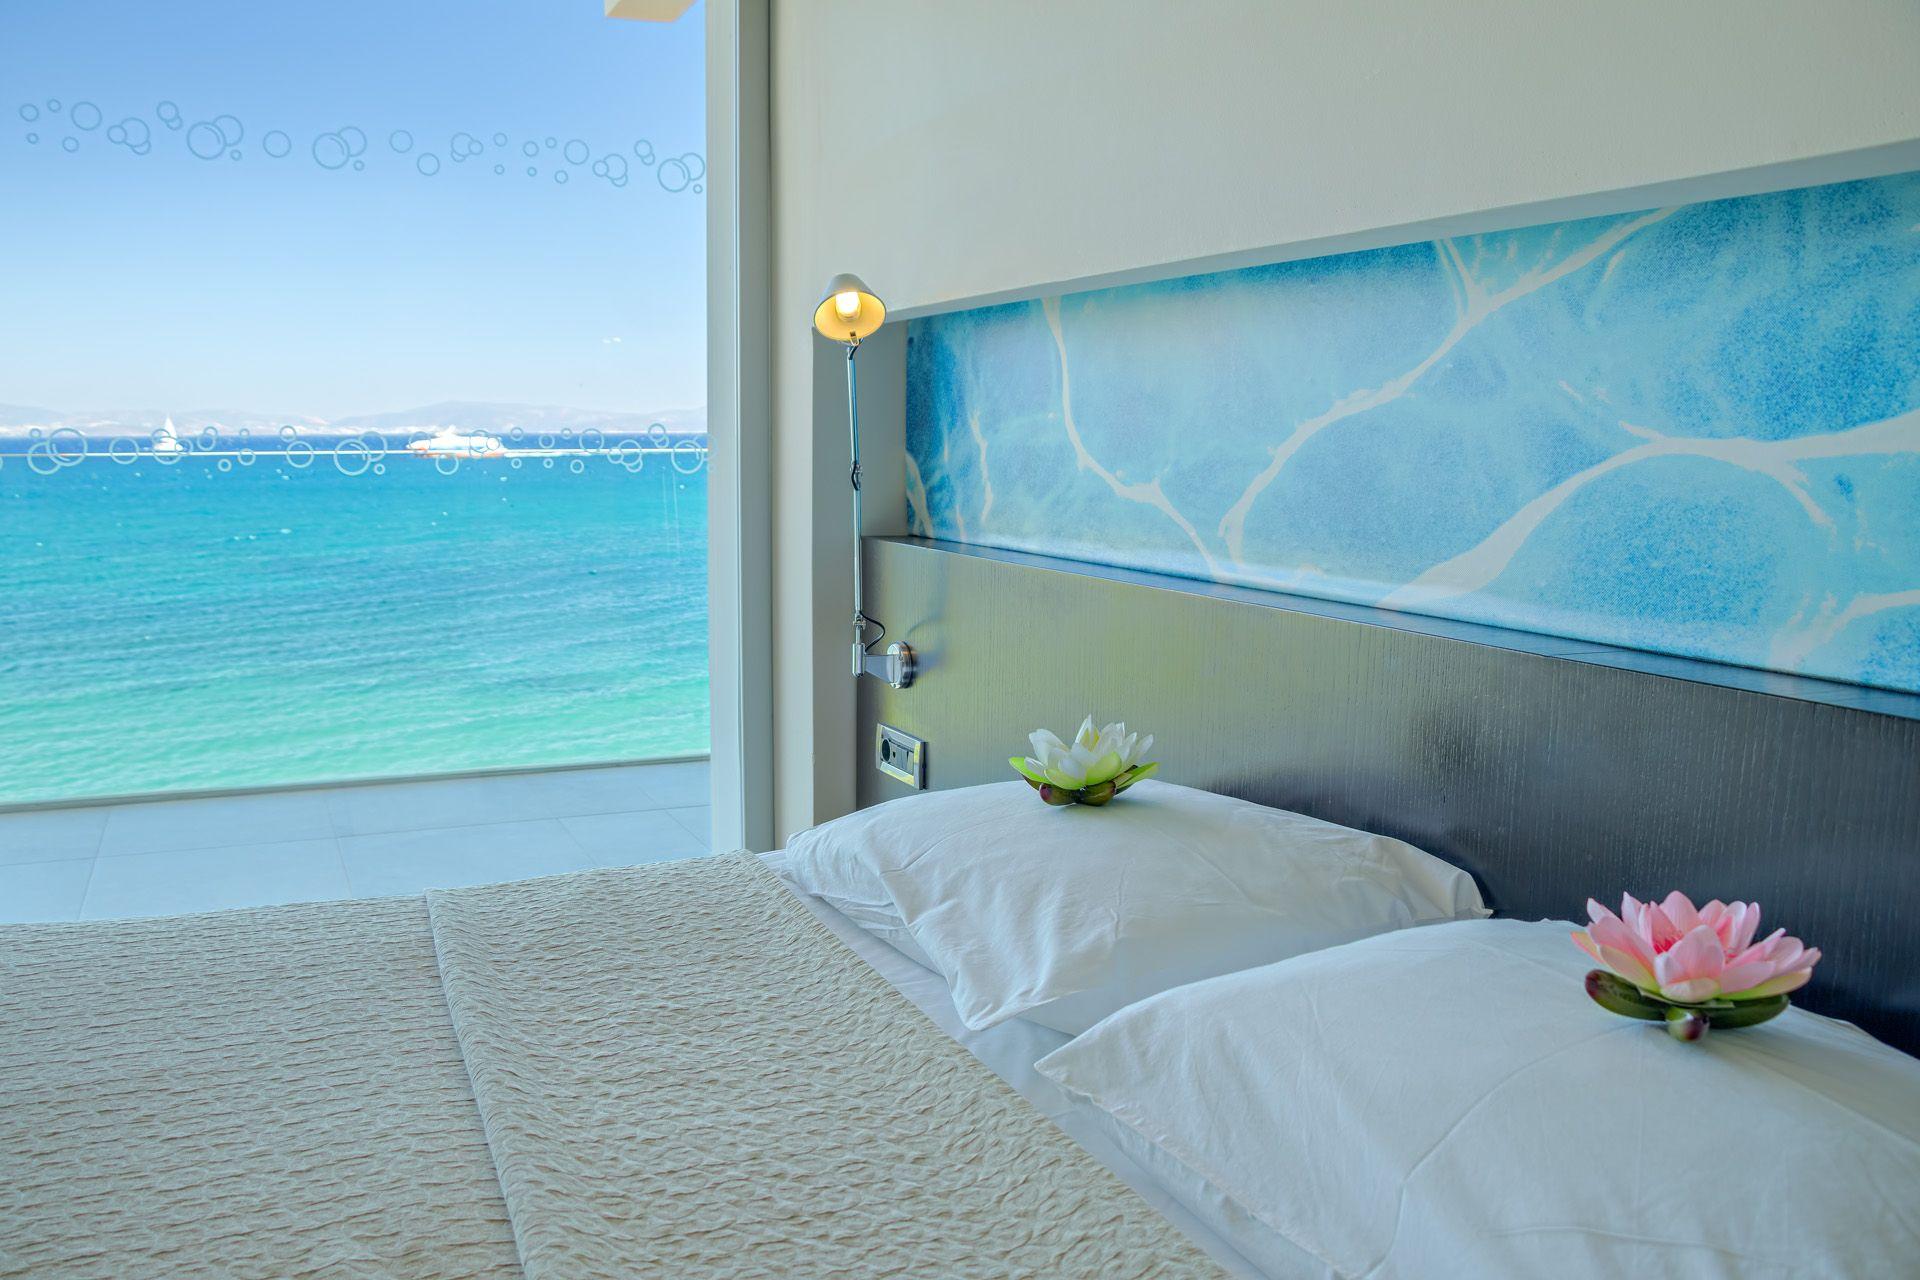 4* Kos Aktis Art Hotel - Κως ✦ 2 Ημέρες (1 Διανυκτέρευση) ✦ 2 άτομα ✦ Πρωινό ✦ 01/09/2020 έως 30/09/2020 ✦ Μπροστά στην Παραλία!